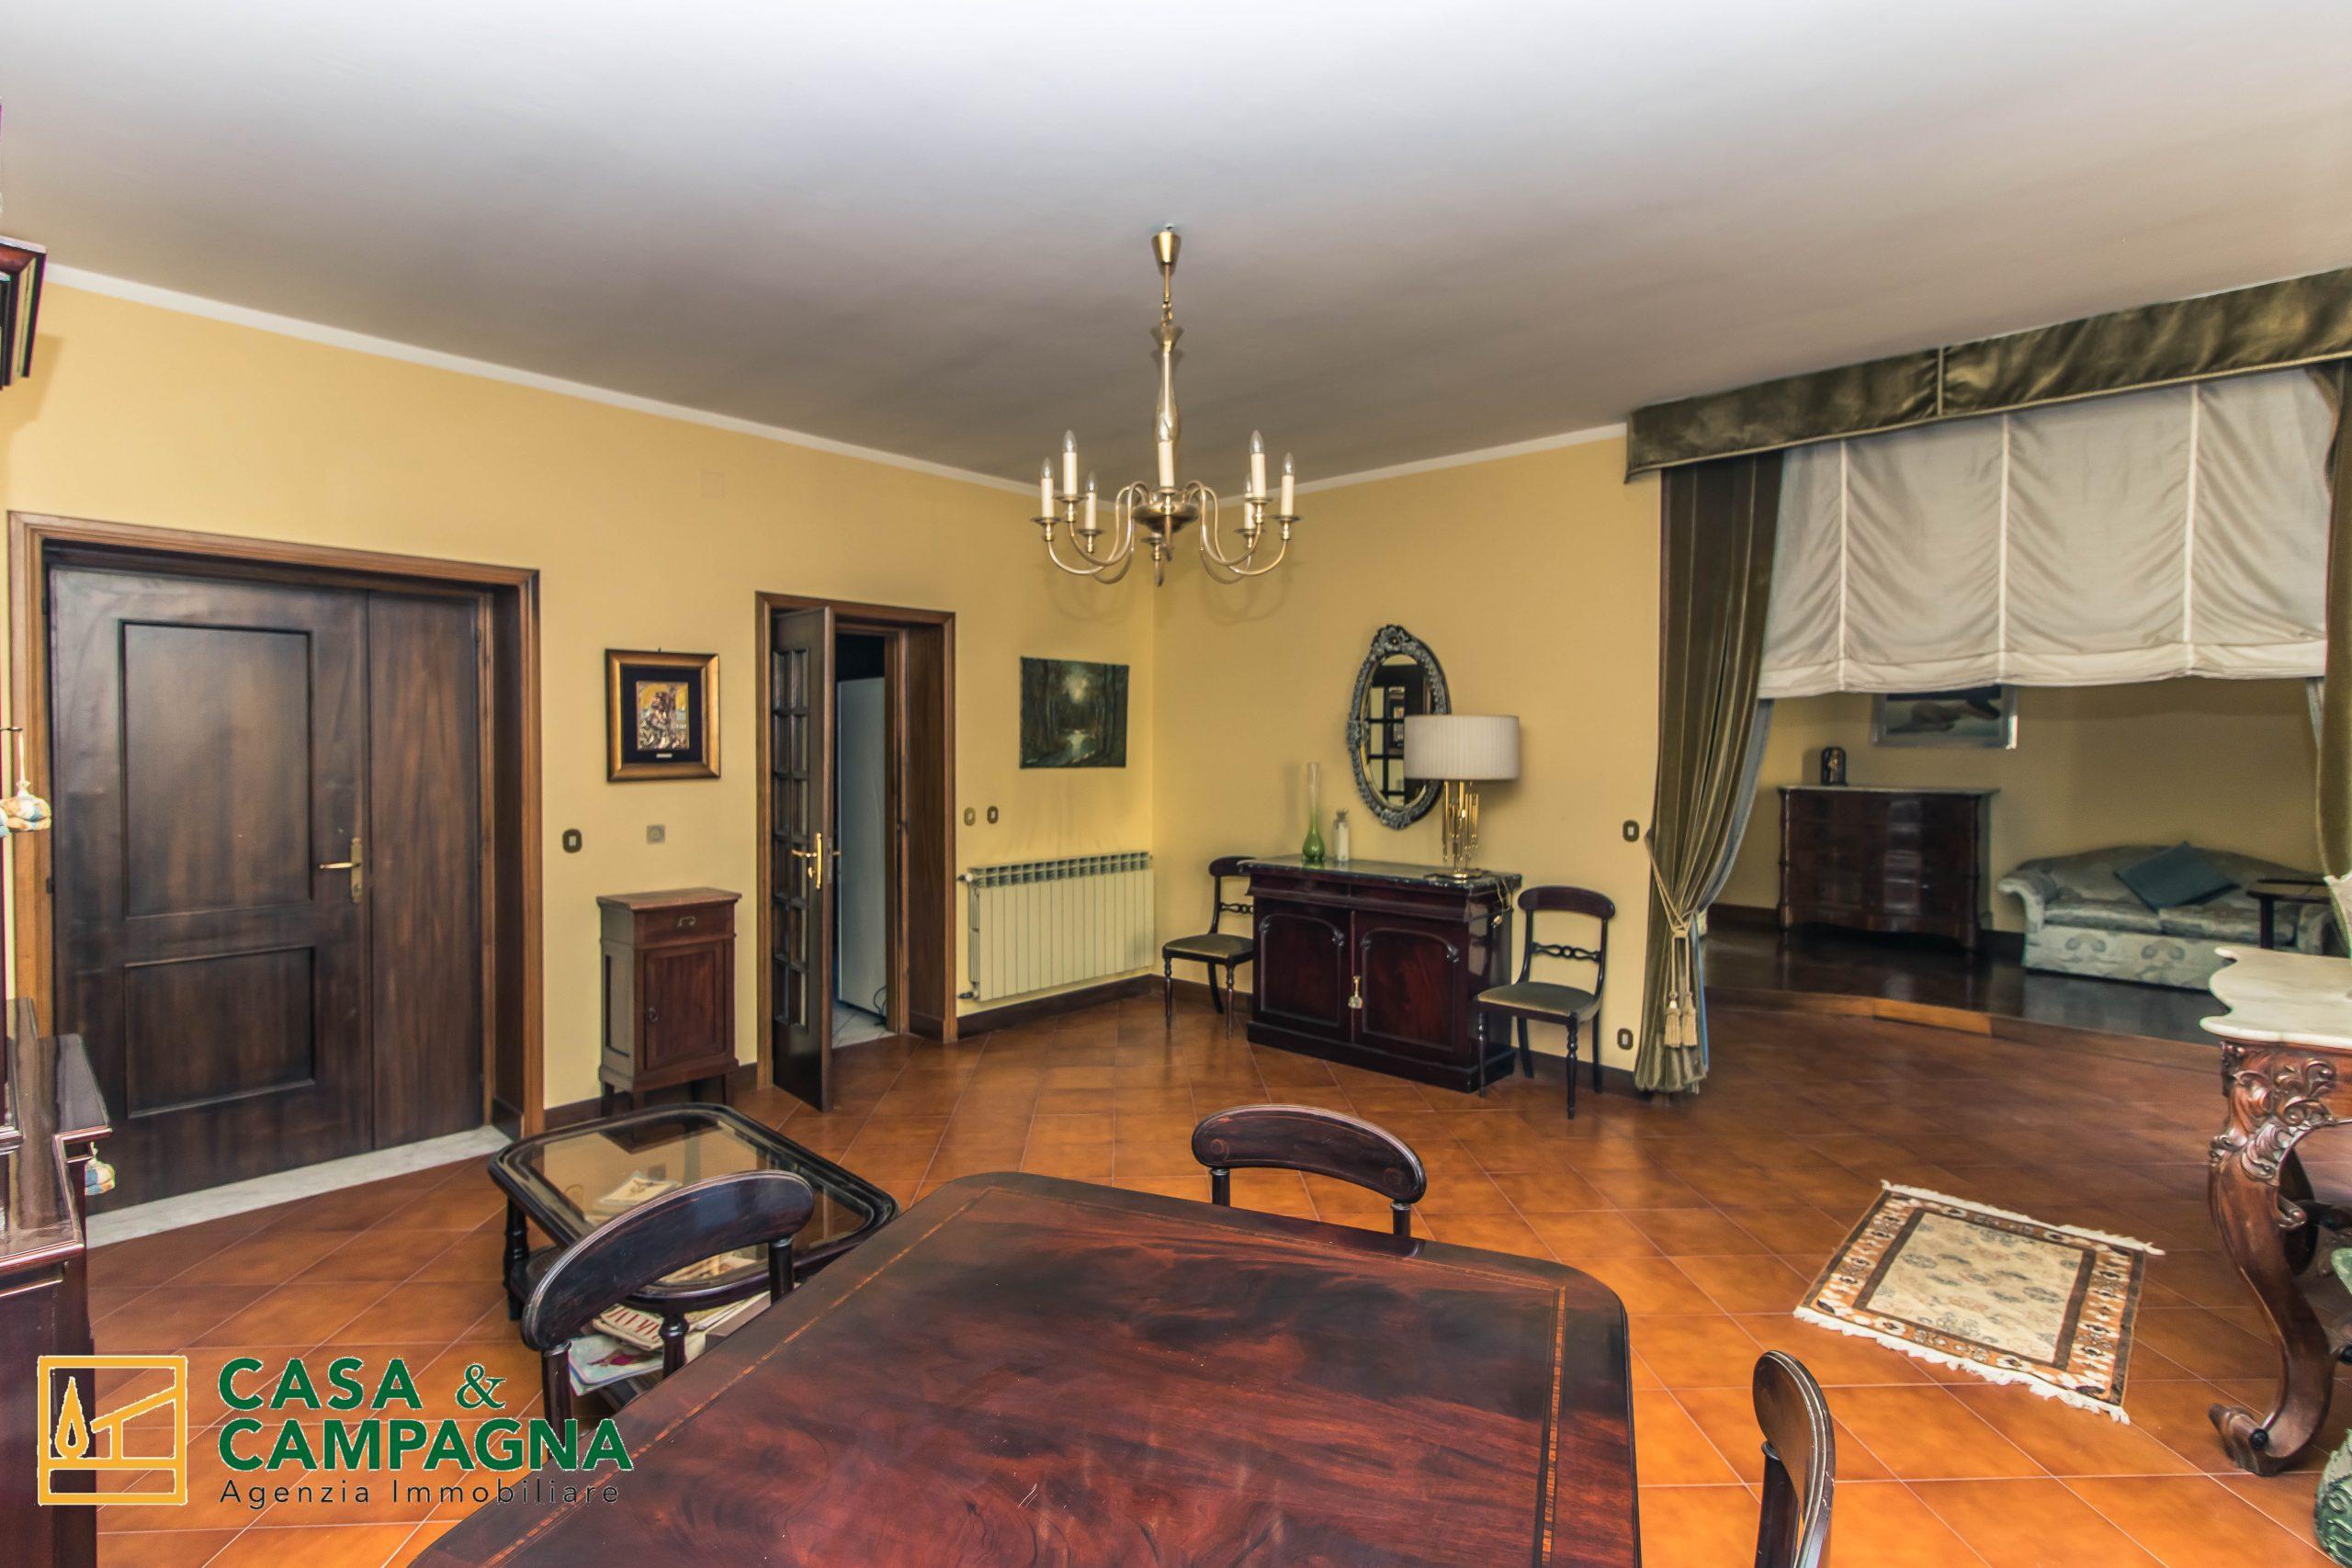 Appartamento in affitto Pietramelara